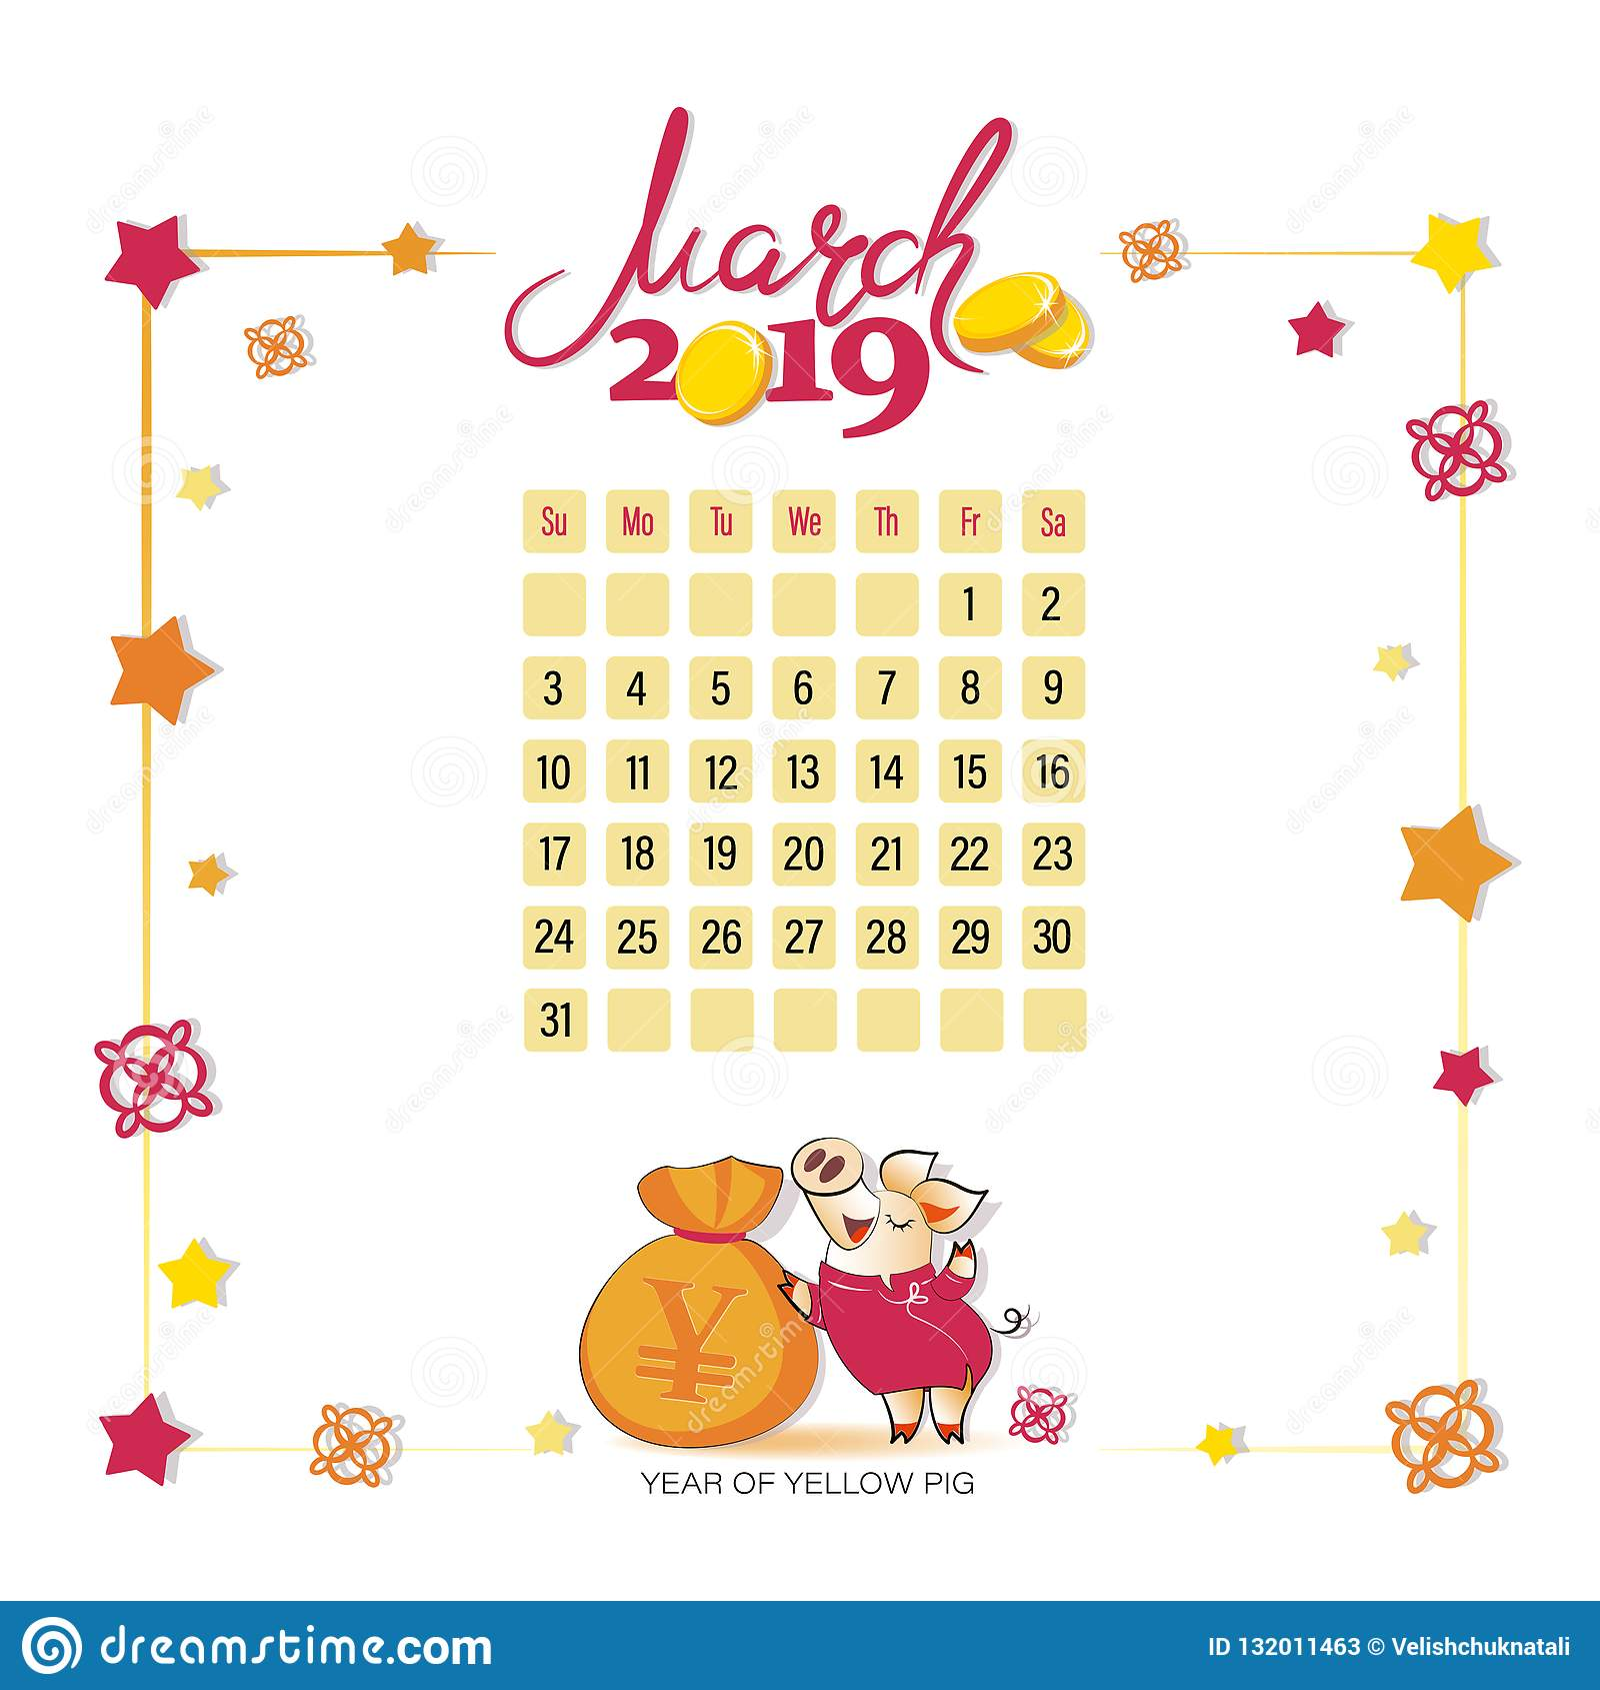 Calendario Di Borsa.Calendario 2019 Per Marzo Maiale Giallo Con Una Borsa Di